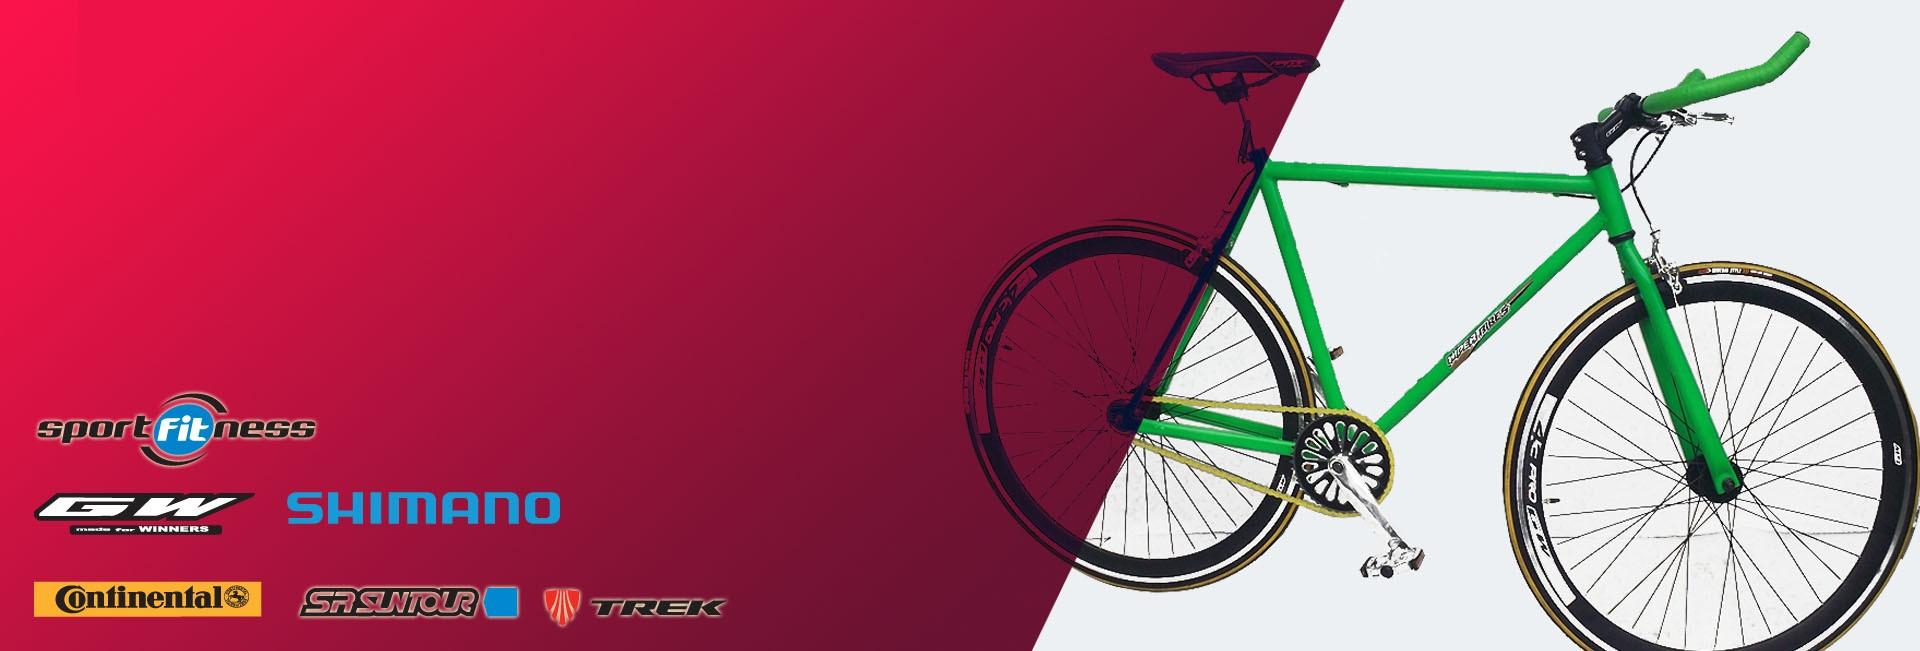 Compra hoy tu Bicicleta fixed o Urbana